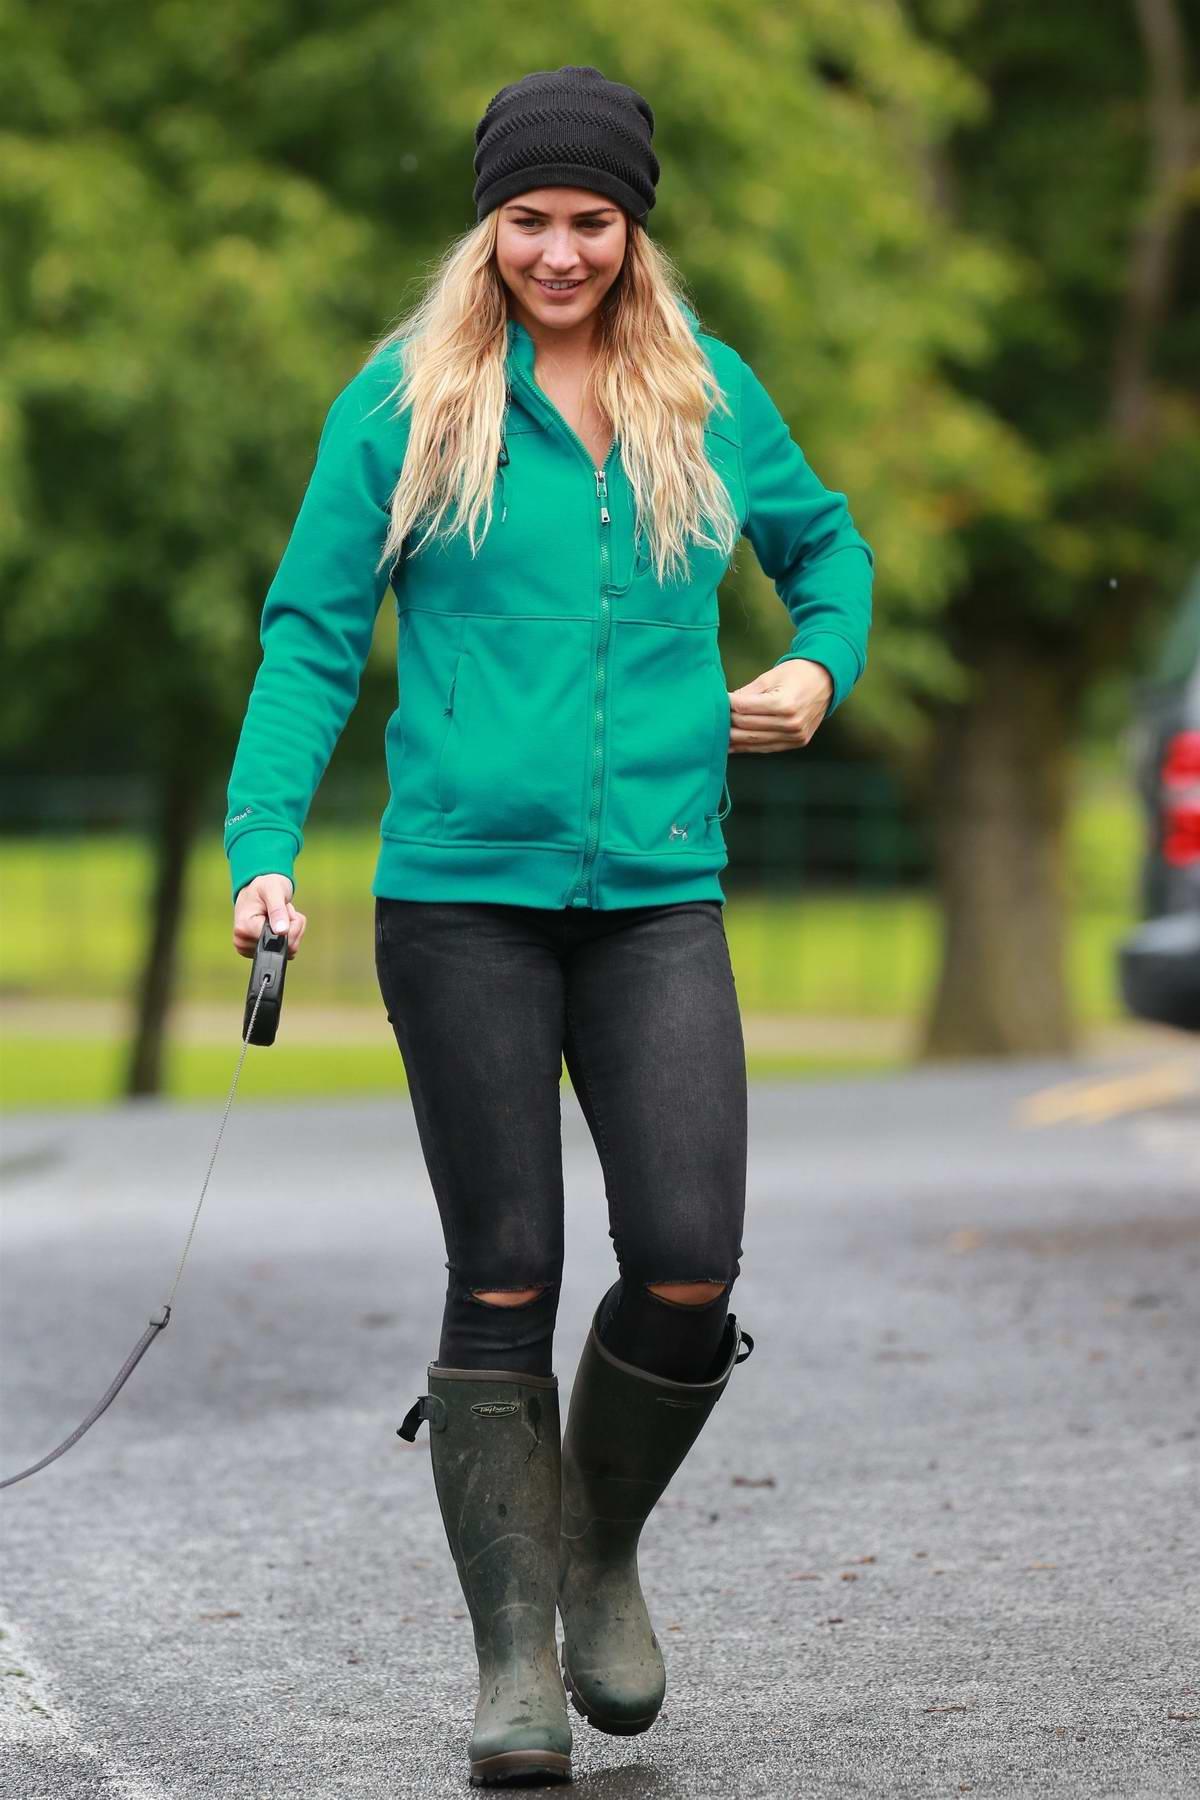 Gemma Atkinson at Charity Dog Walk in Manchester, UK